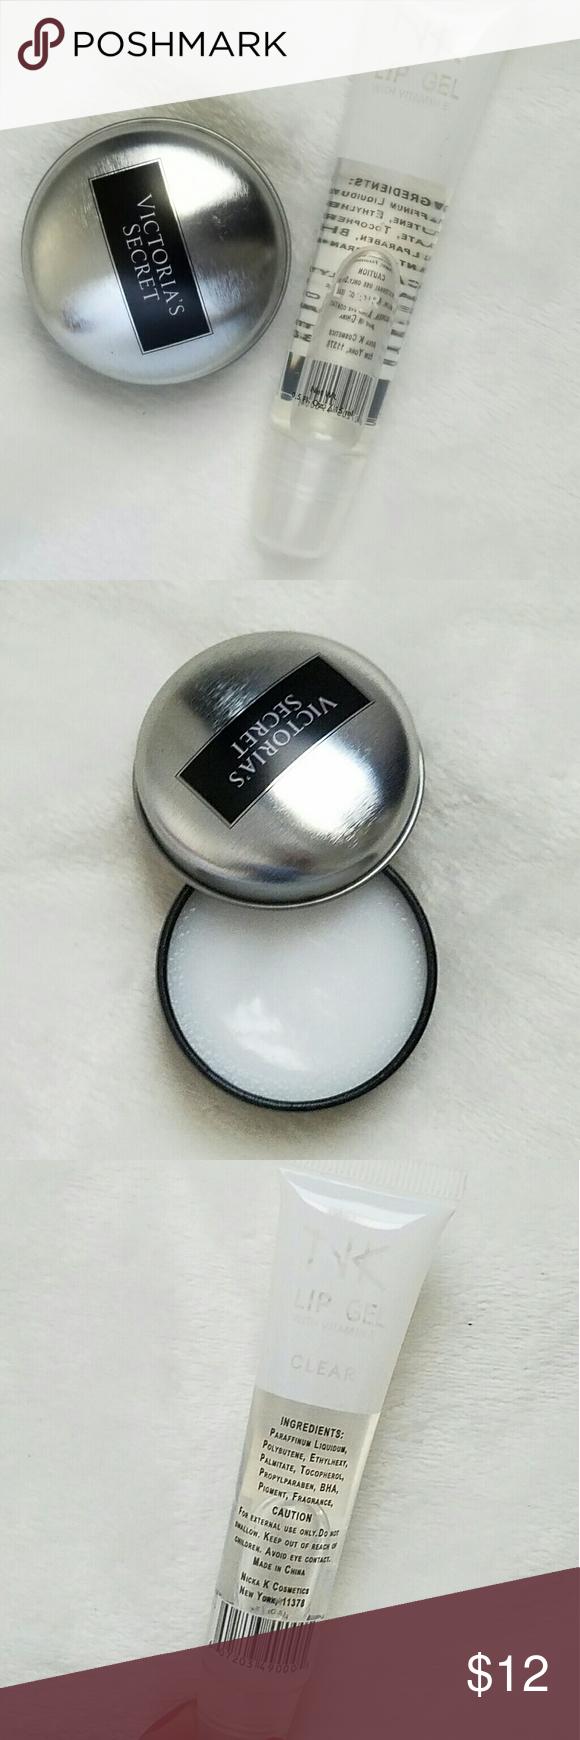 clear gloss bundle Victoria's Secret lip balm pot clear gloss Victoria's Secret Makeup Lip Balm & Gloss